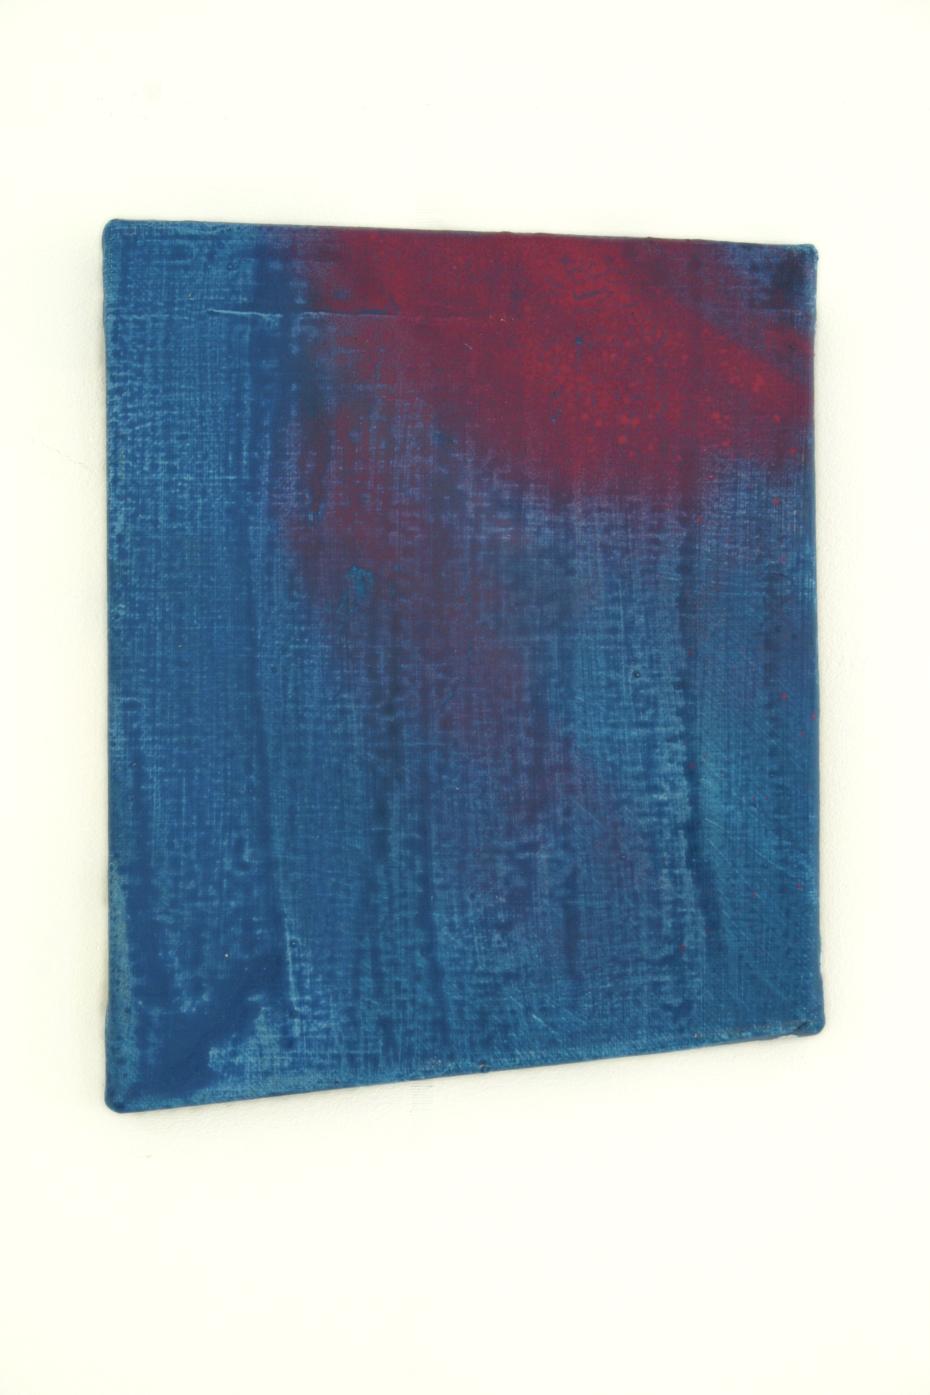 Giel Louws 30 x 24 cm 2016